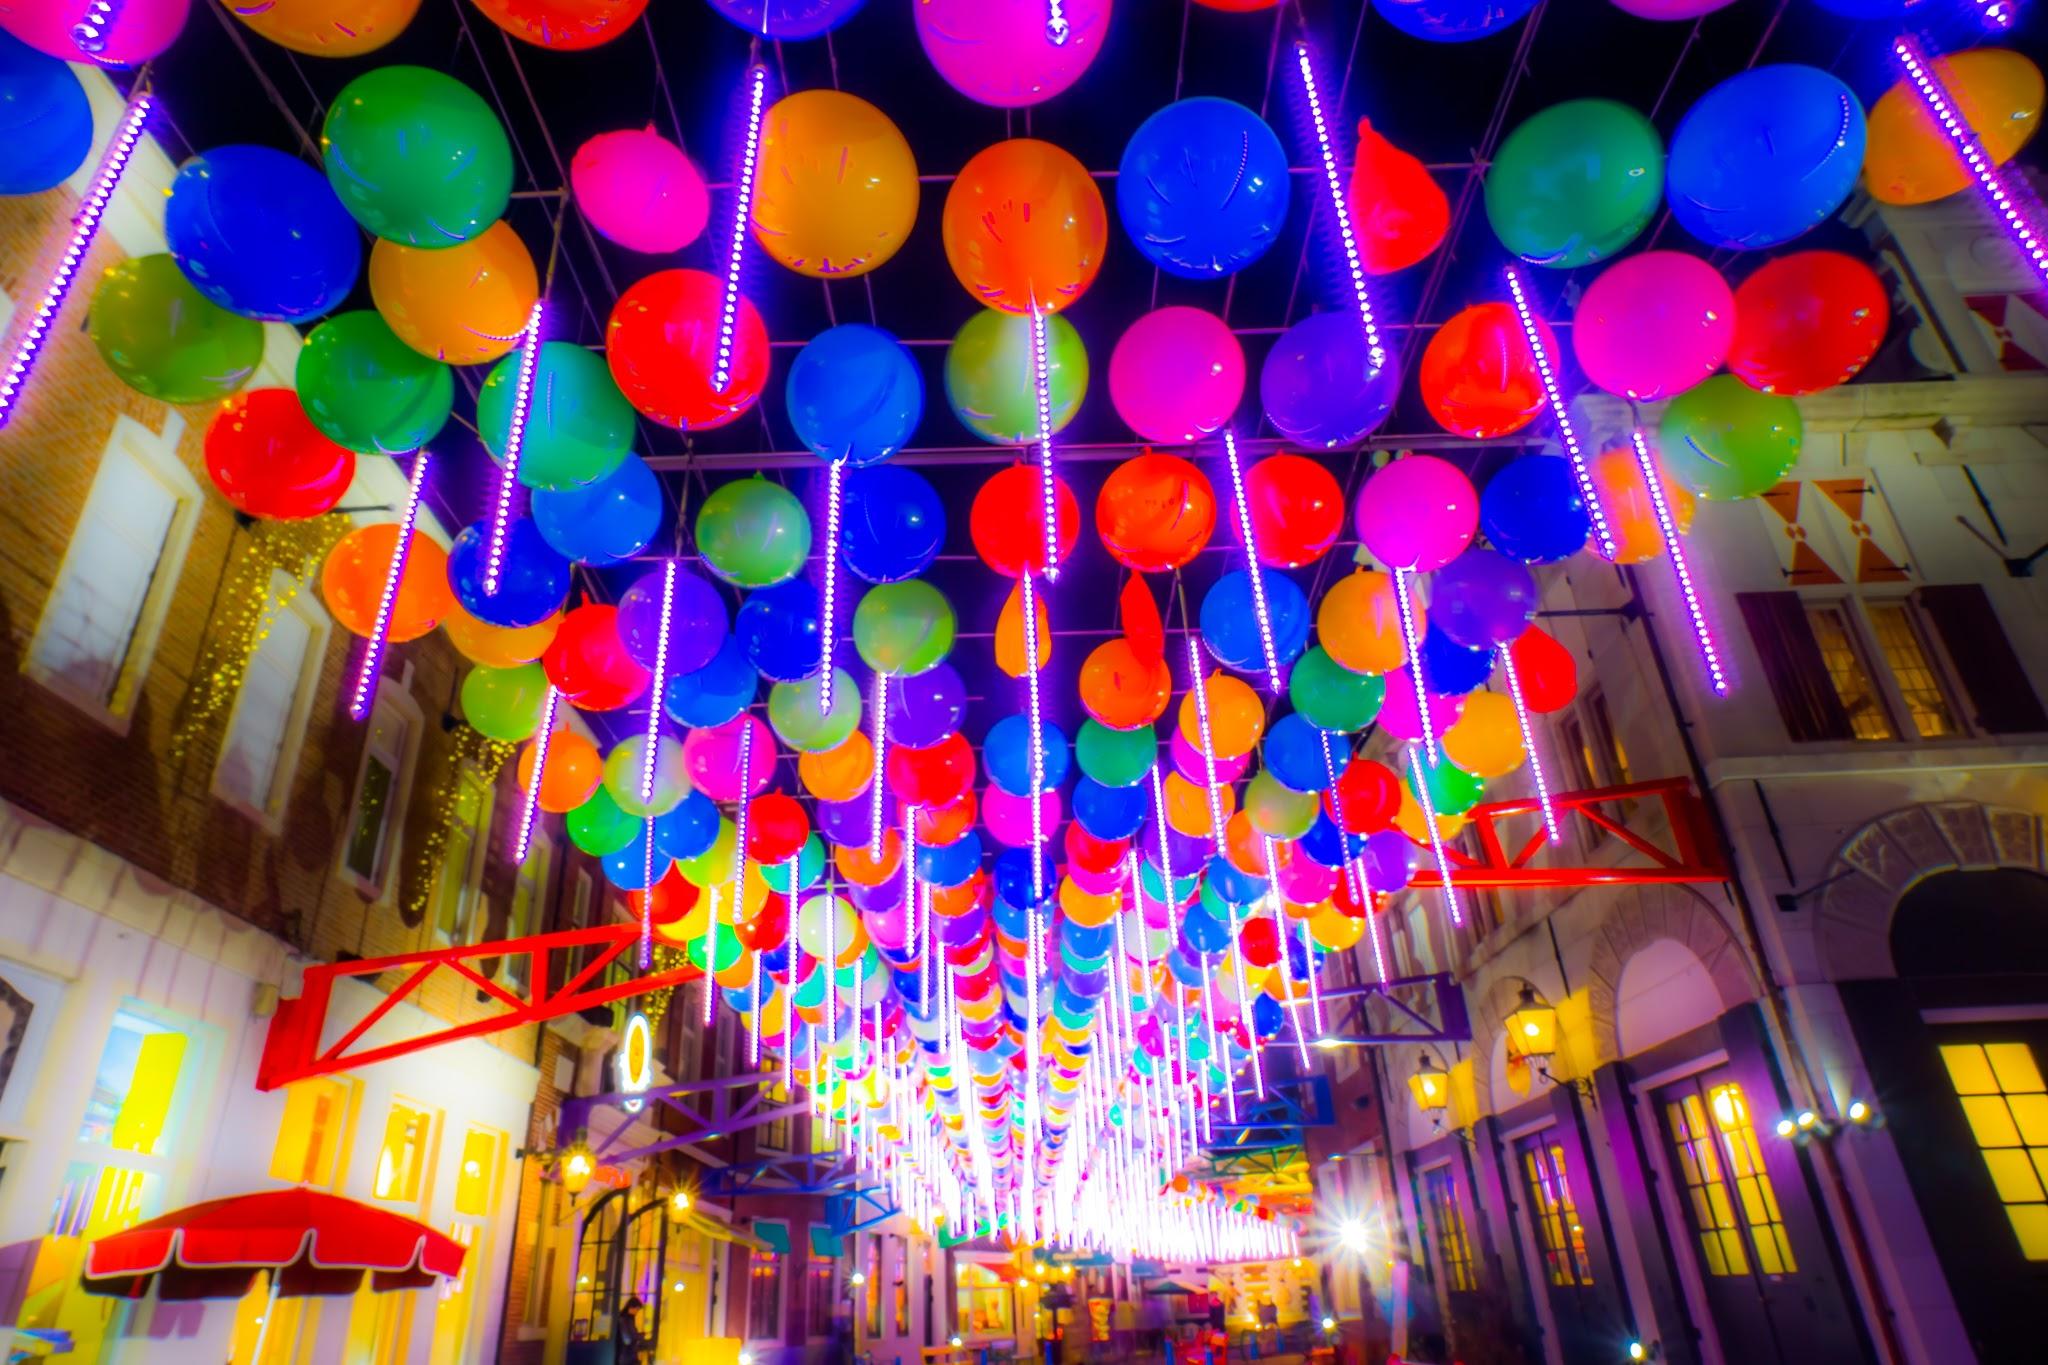 Huis Ten Bosch illumination Kingdom of light Happy balloon street1